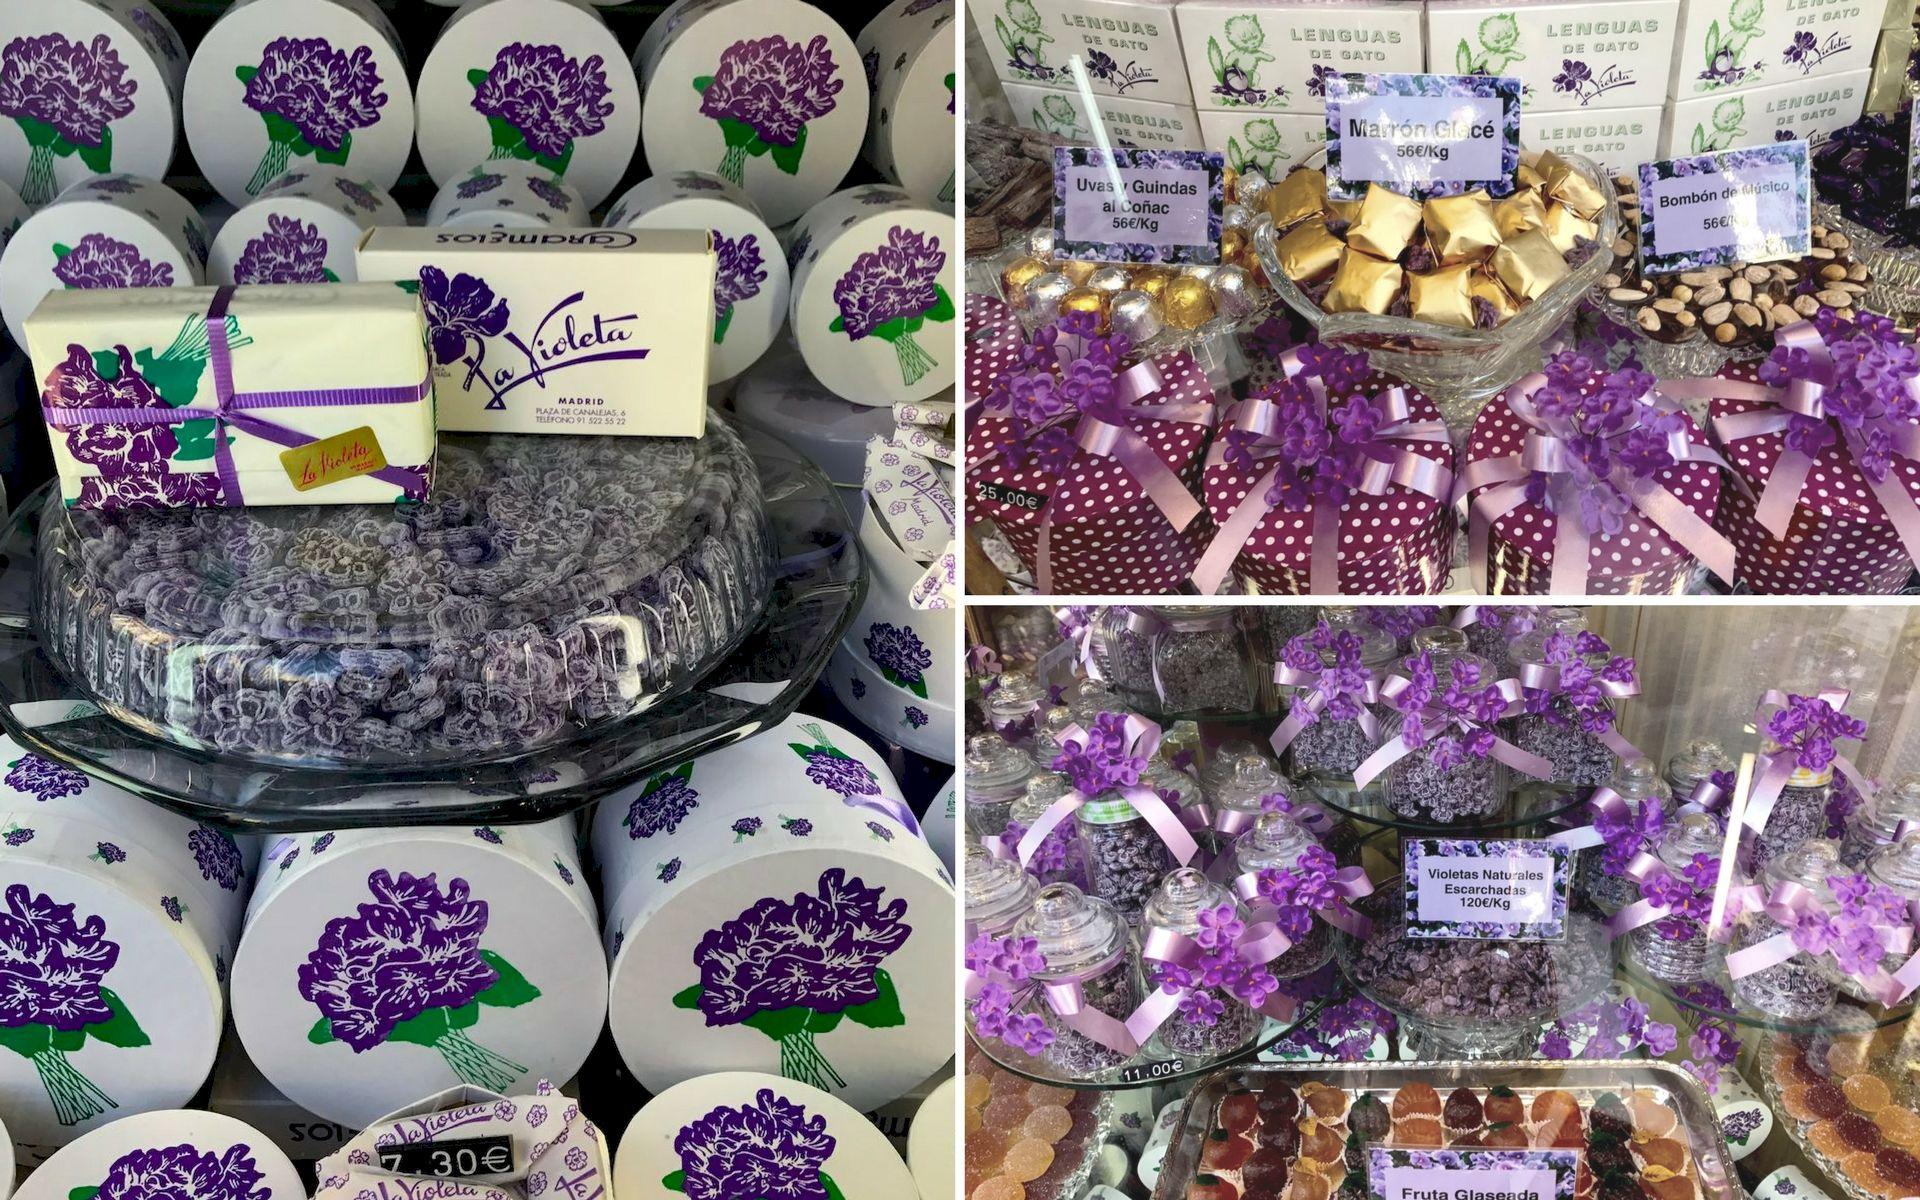 Le caramelle a La Violeta Madrid